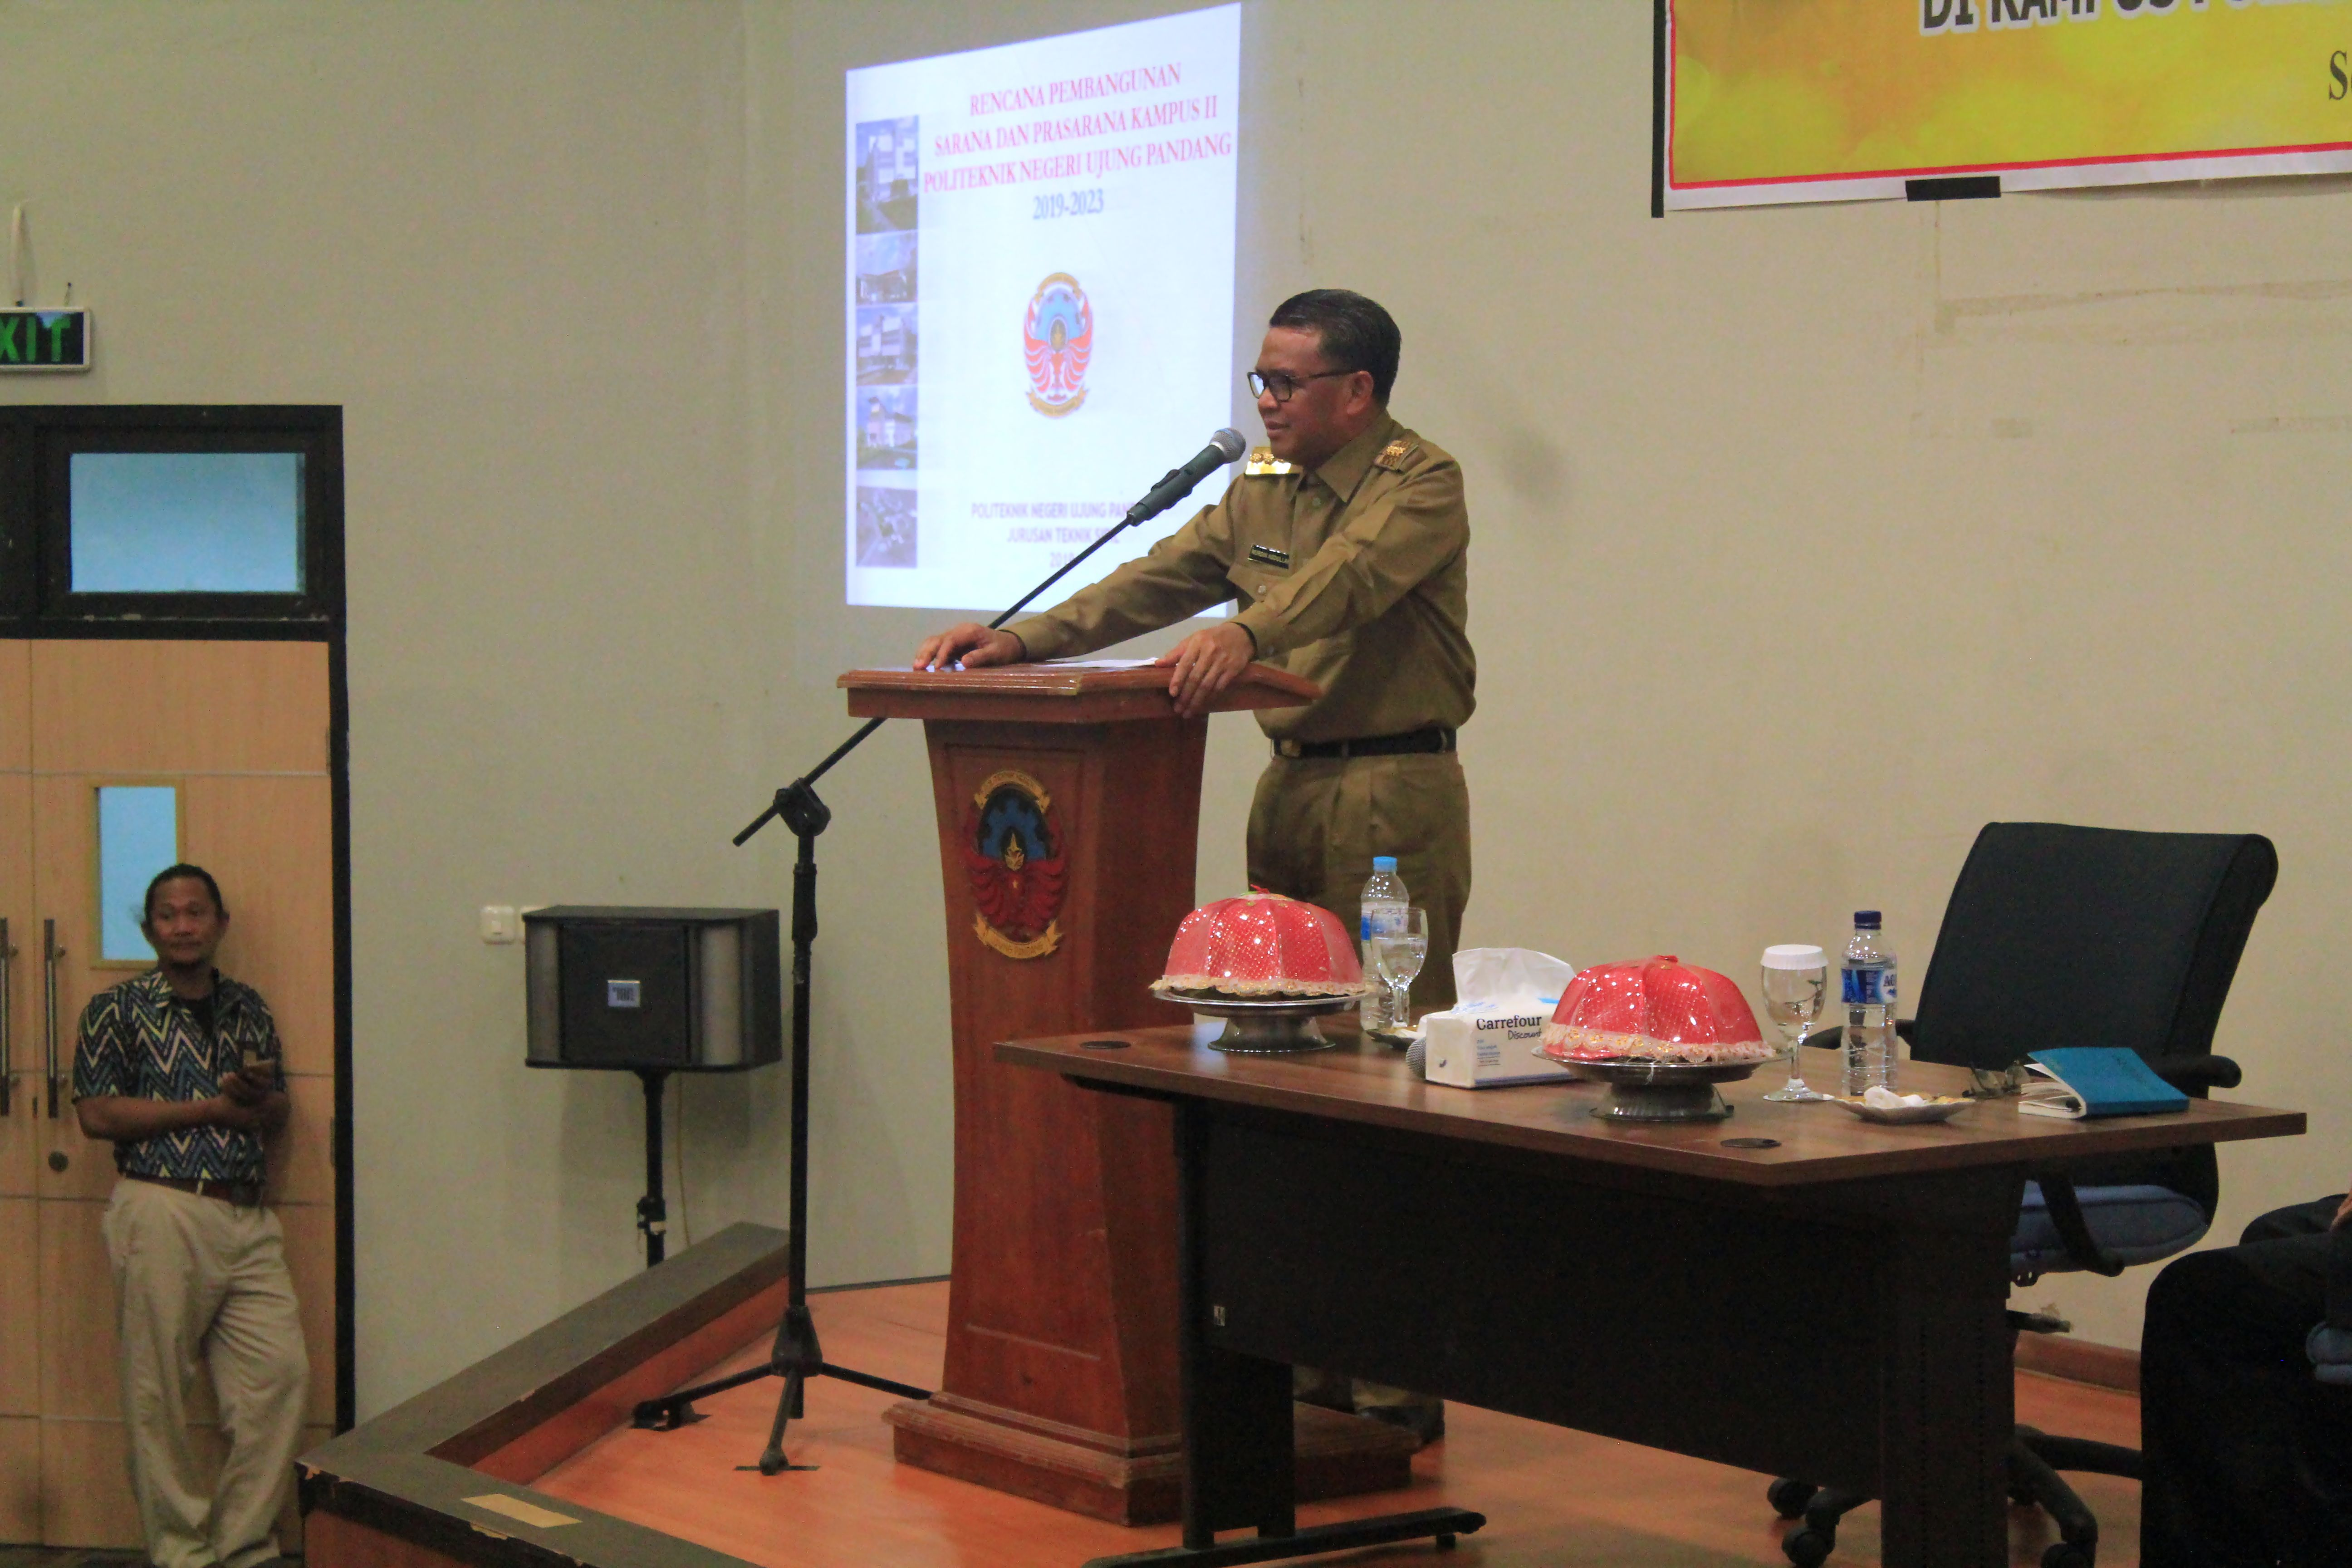 Gubernur Sulsel Kunker ke PNUP, Dorong PNUP Lakukan Triple Helix